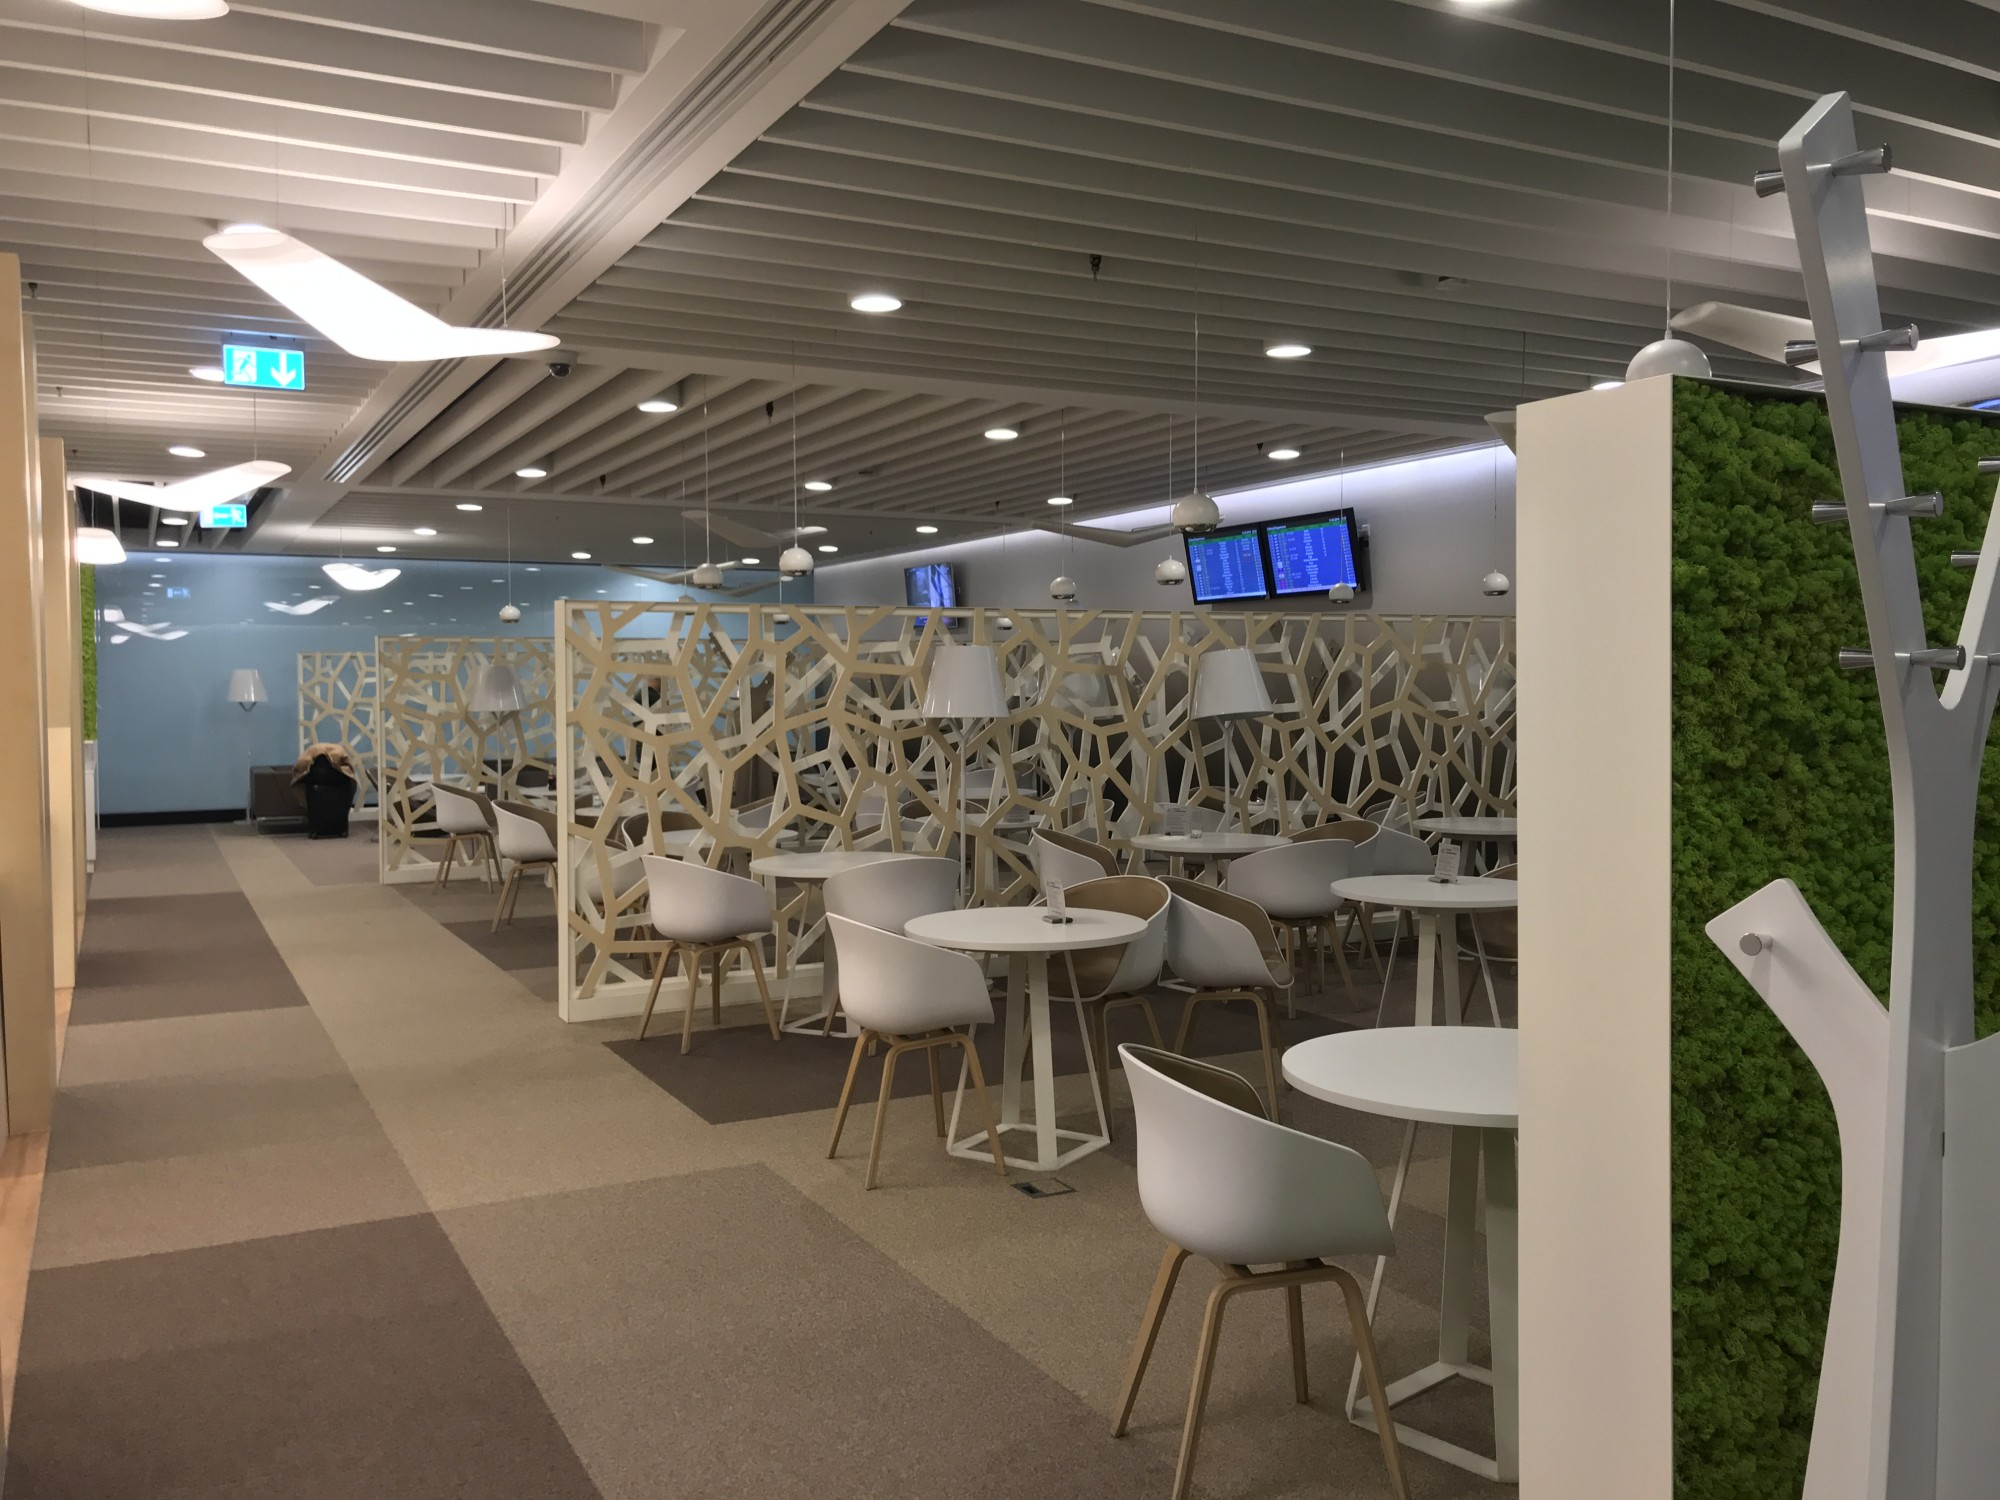 Aeroporto Waw : Waw: preludium executive lounge reviews & photos terminal a